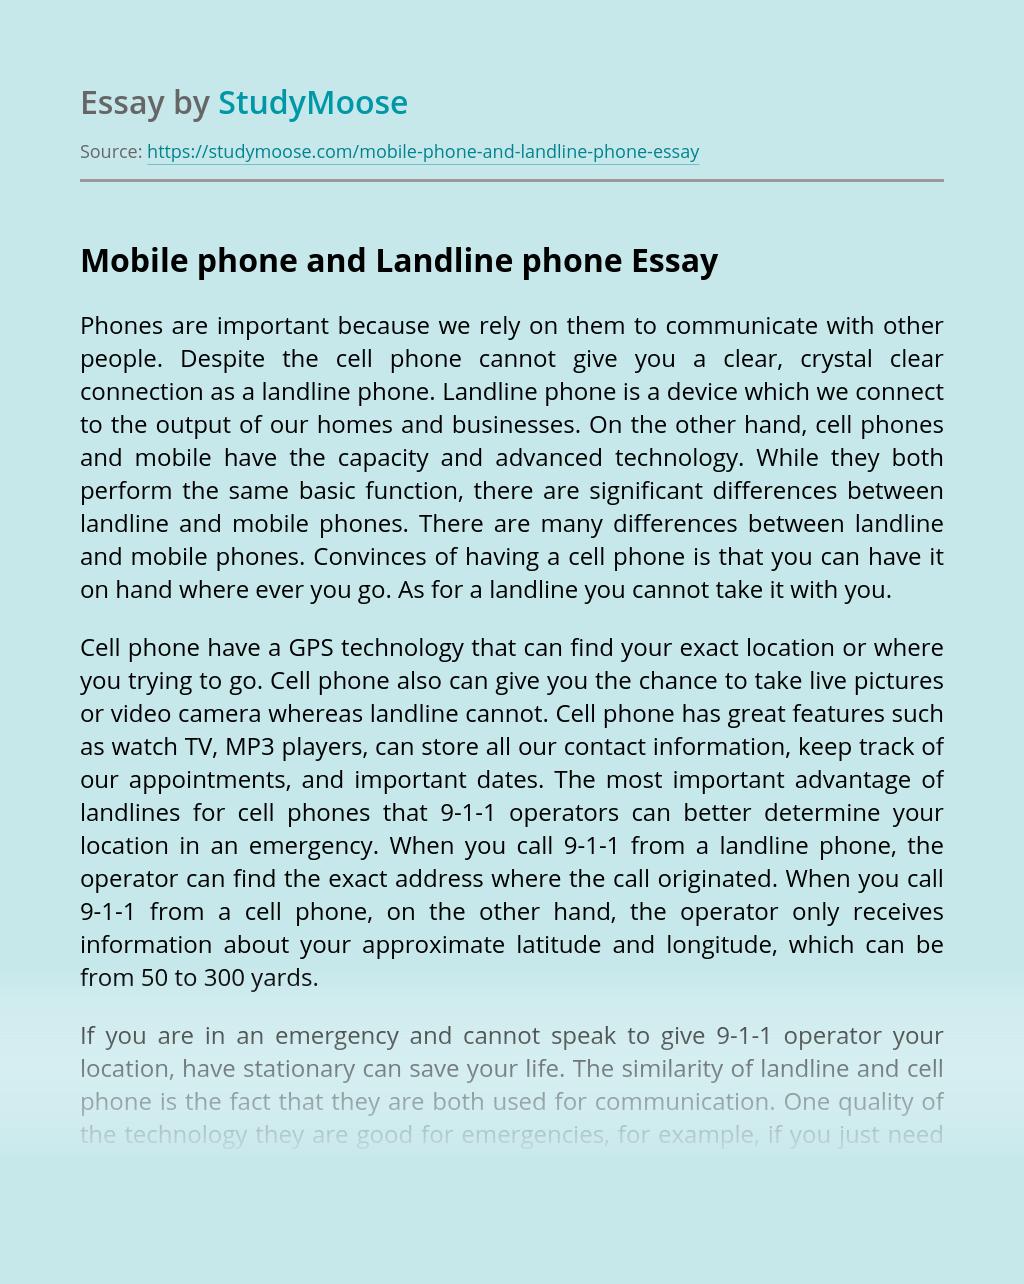 Mobile phone and Landline phone